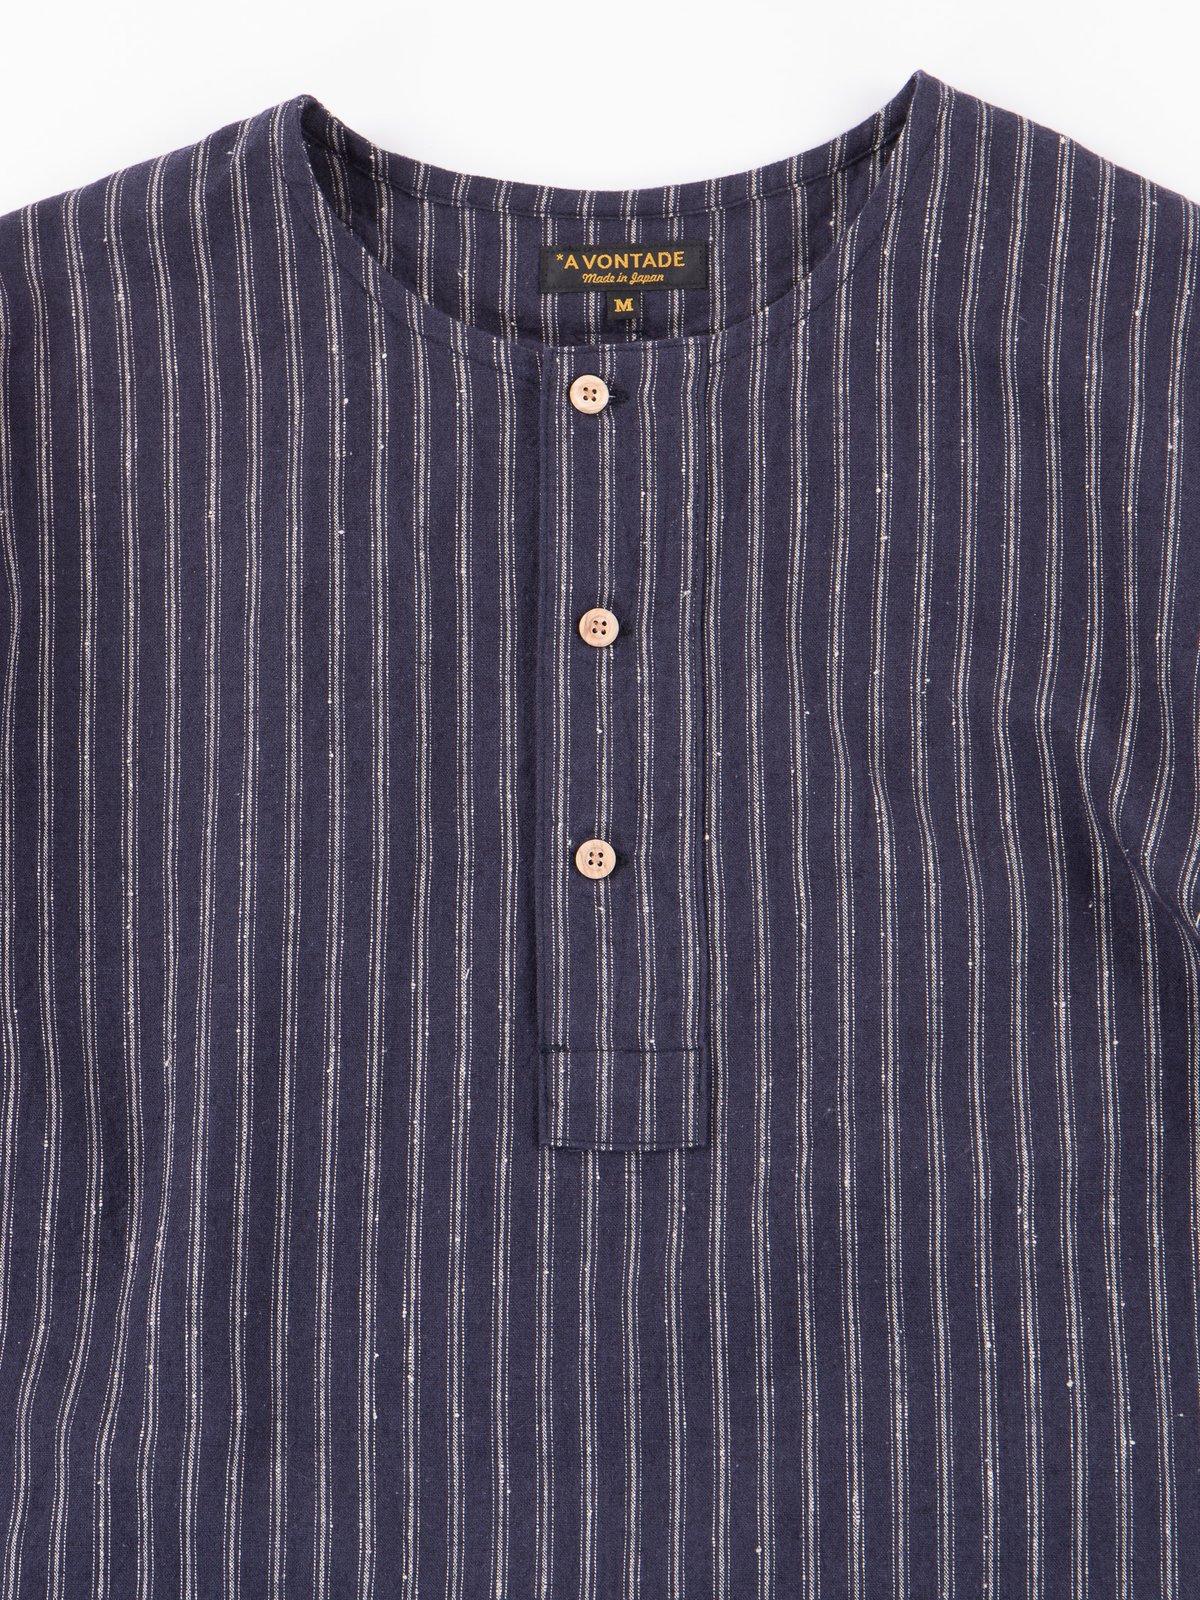 Dark Navy Stripe Henley SS Shirt - Image 2